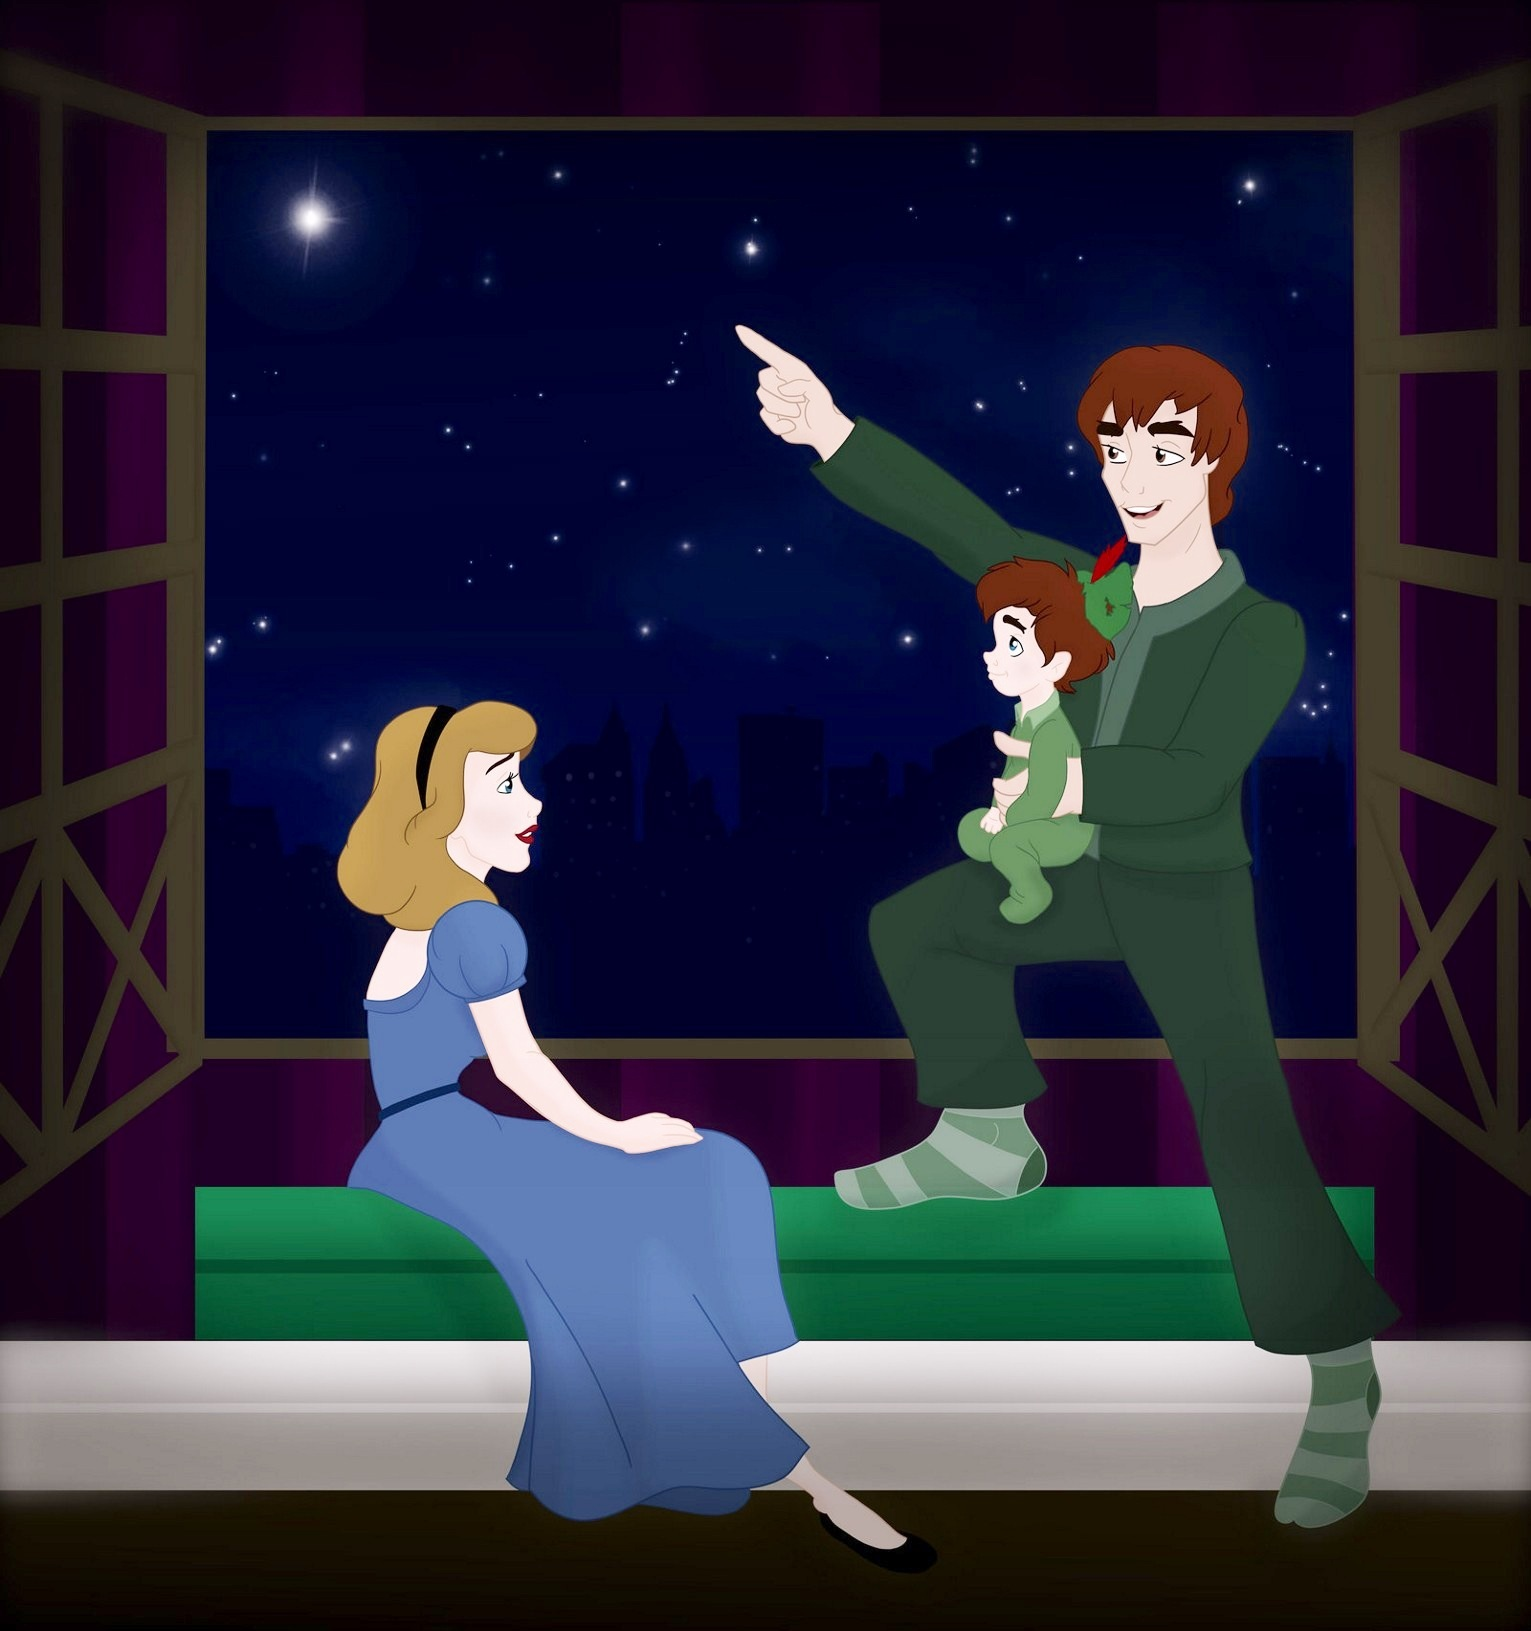 Disney/ Non Families by: Grodansnagel